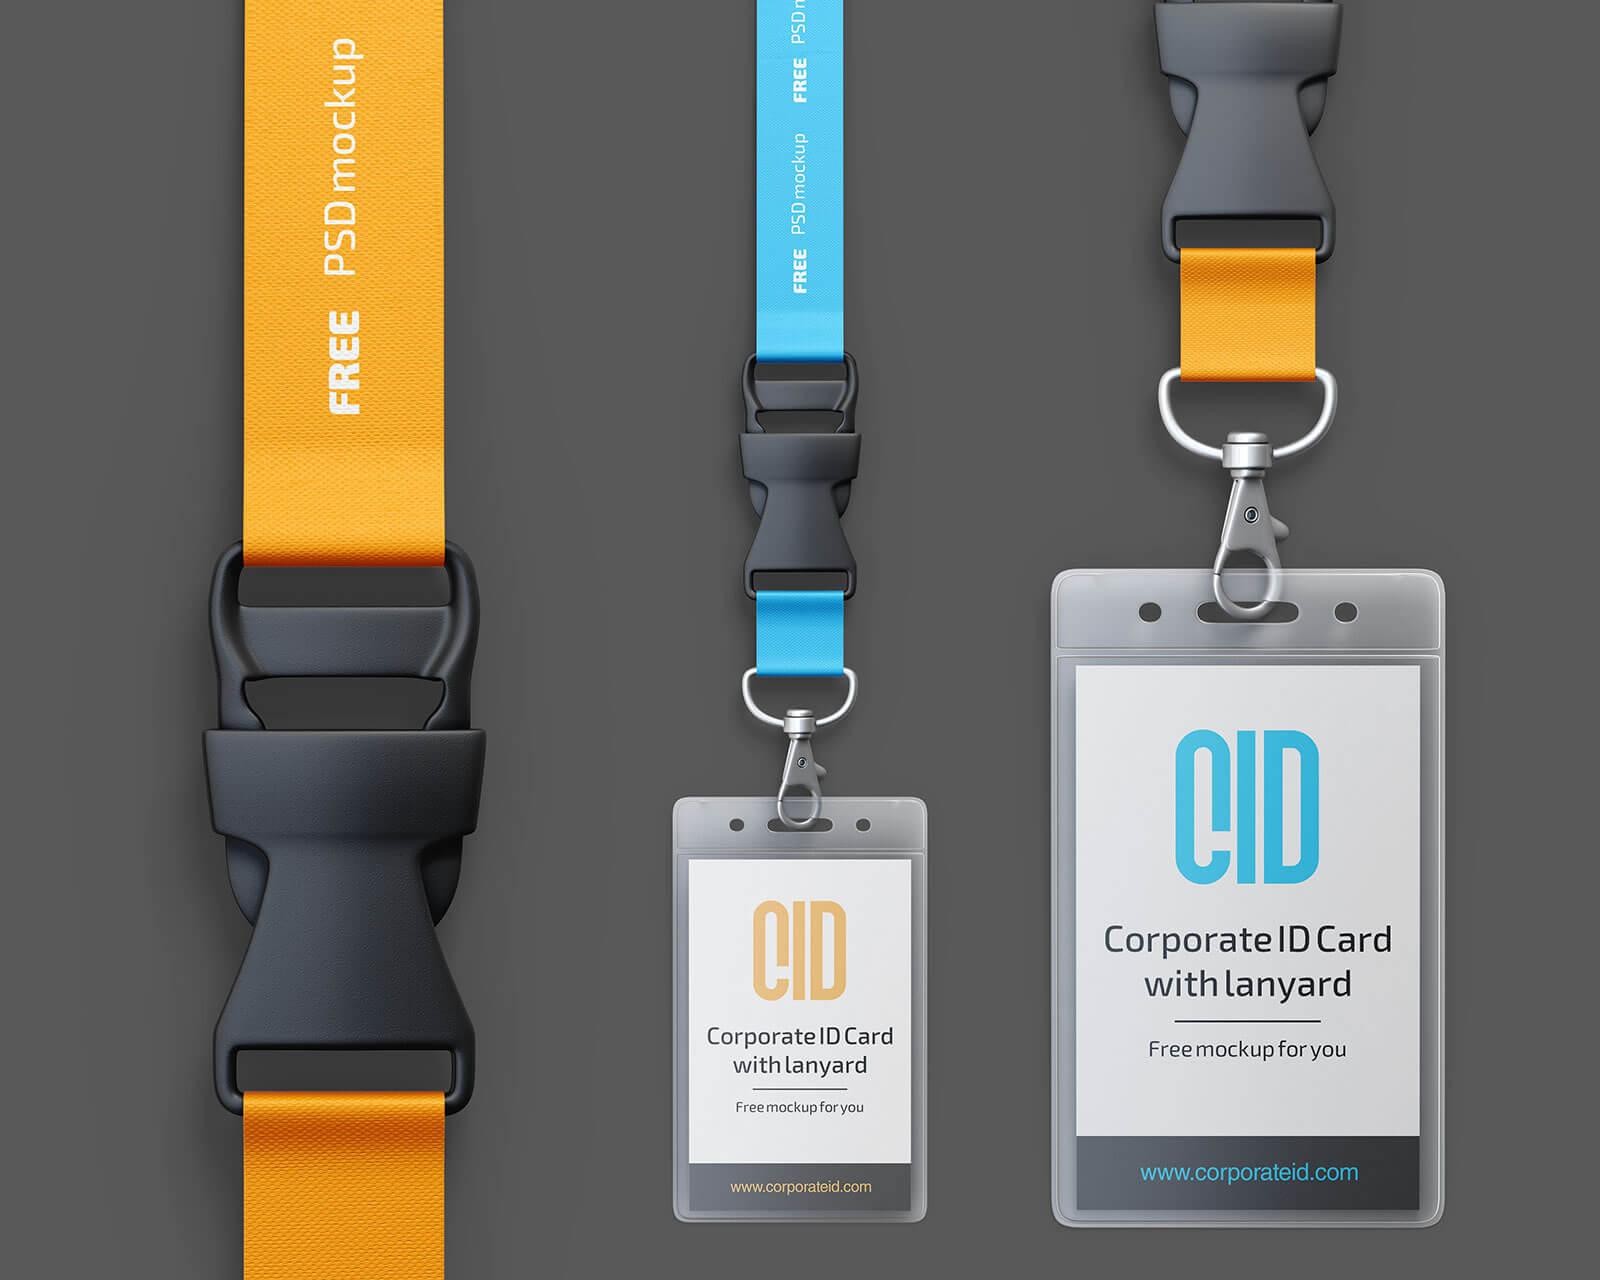 Free-Corporate-ID-Card-Holder-Lanyard-Mockup-PSD-Set